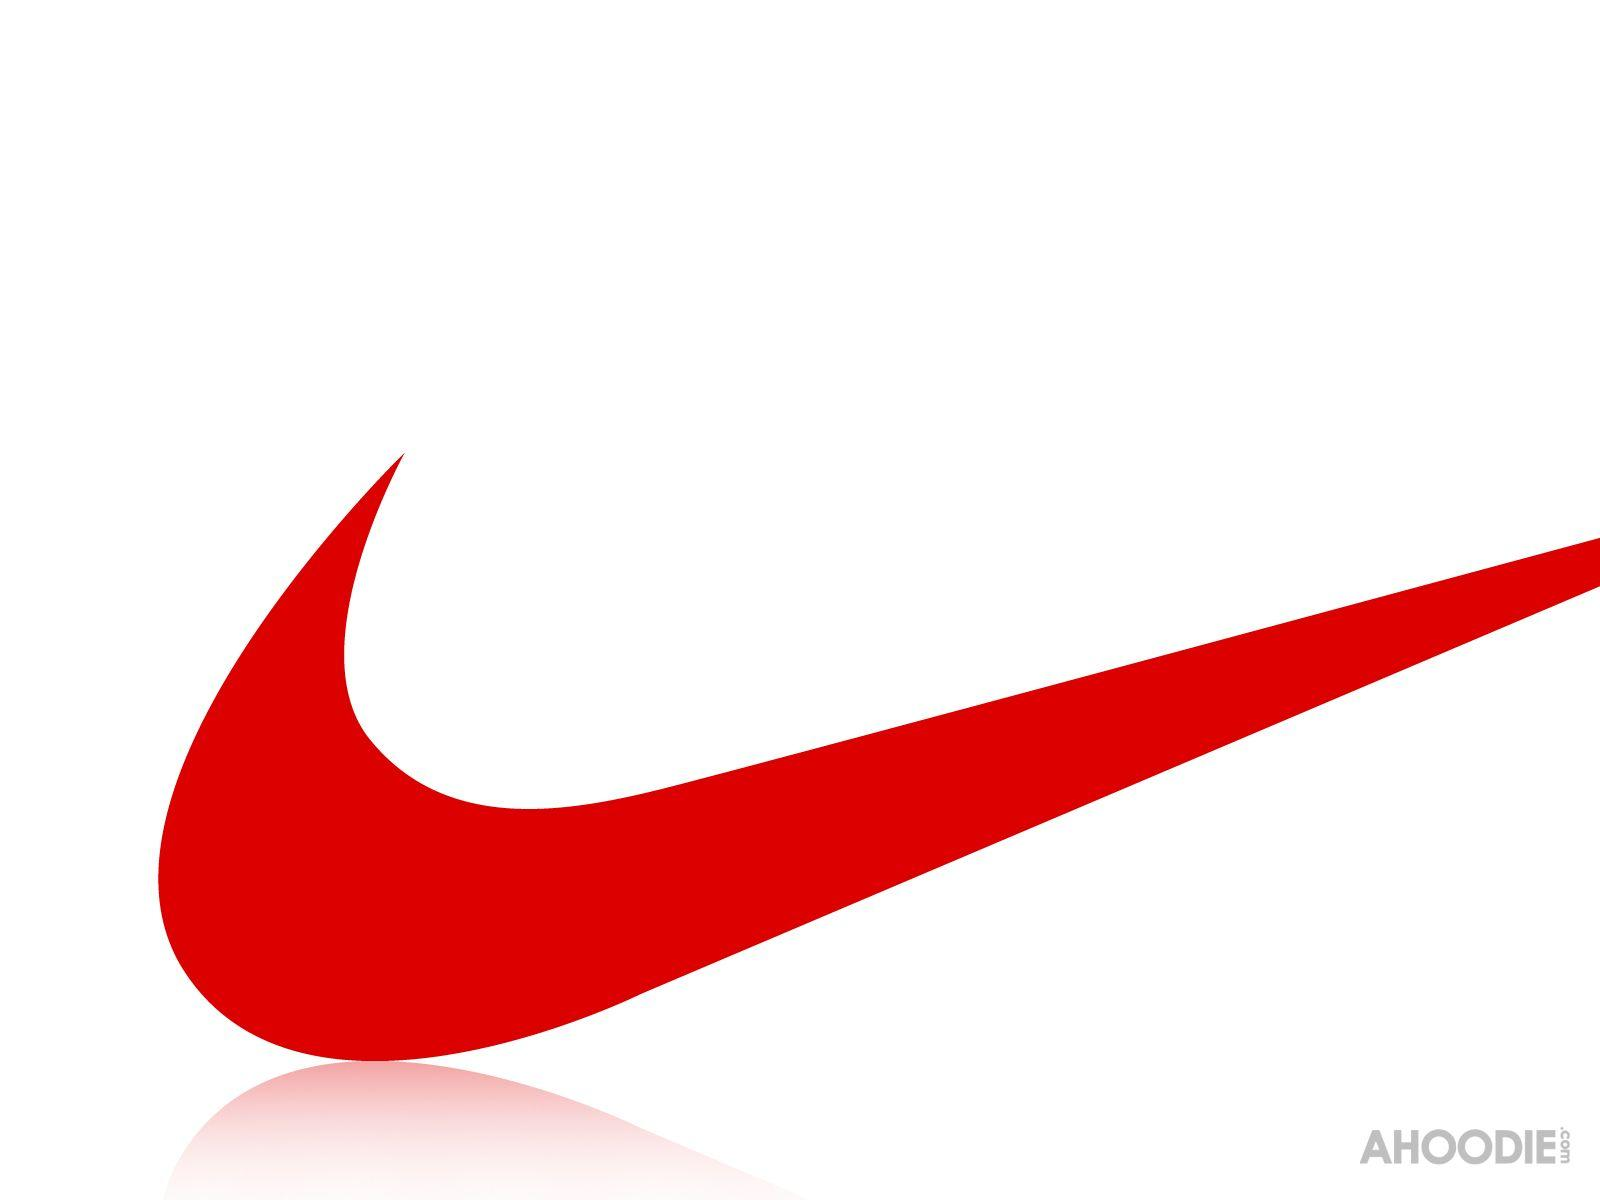 logo nike red transparent png